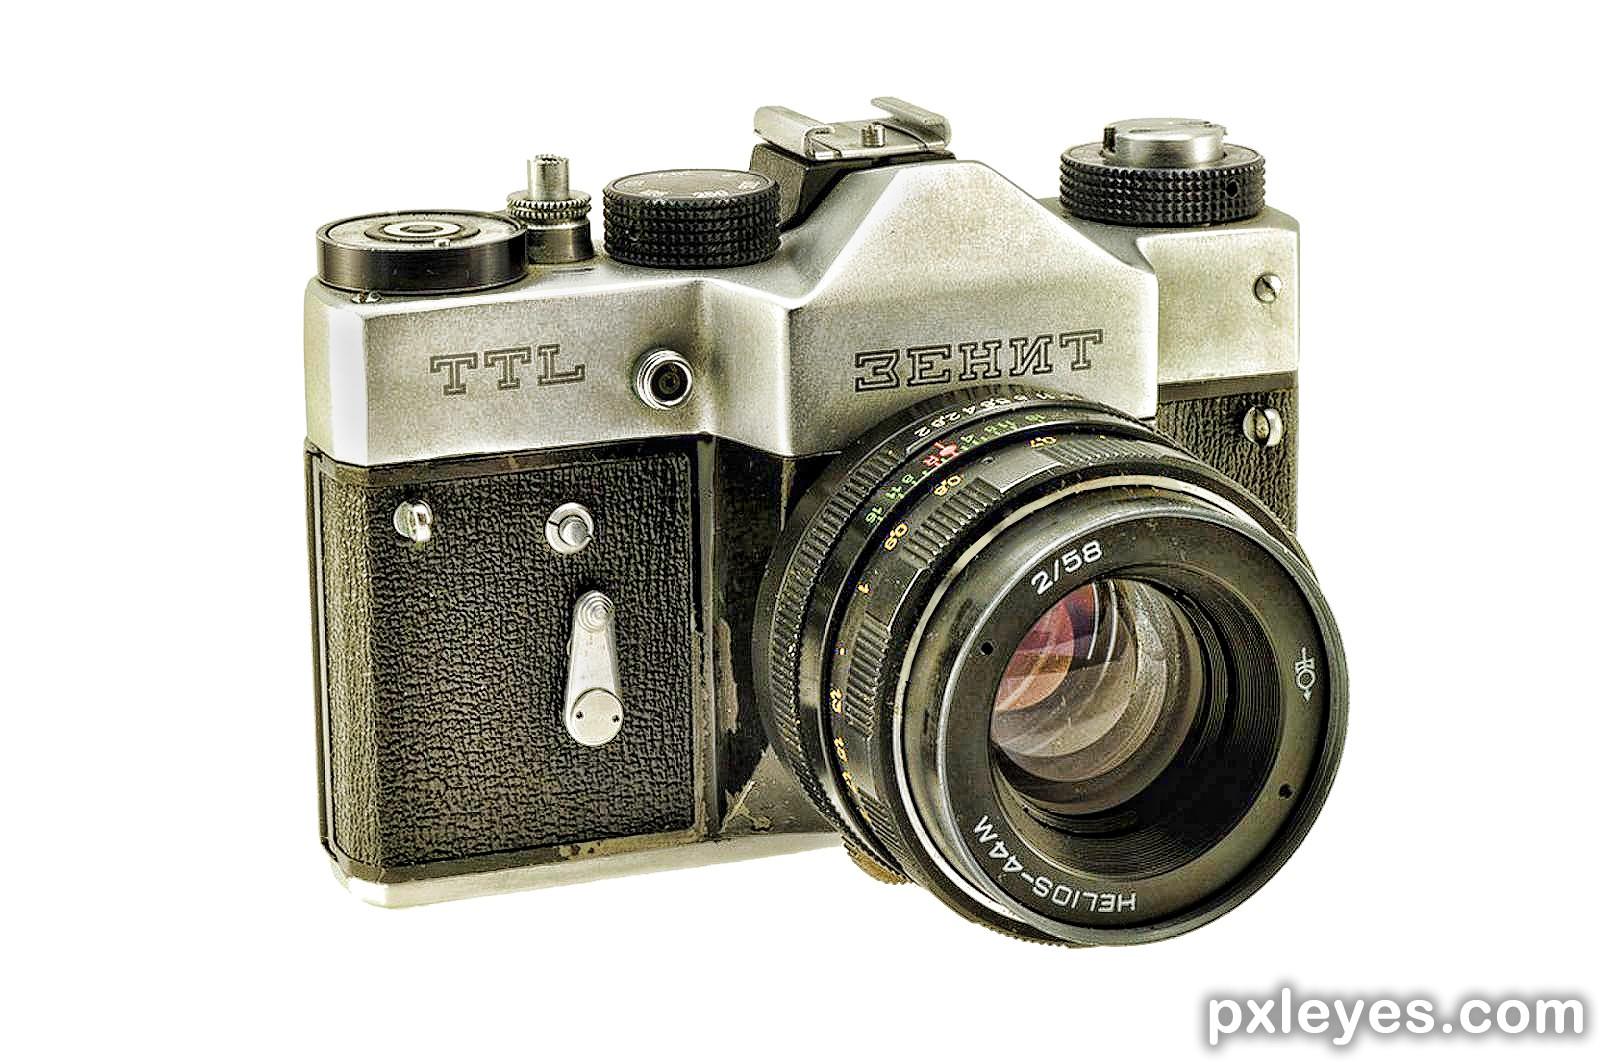 Цифровой фотоаппарат из зенита своими руками 92